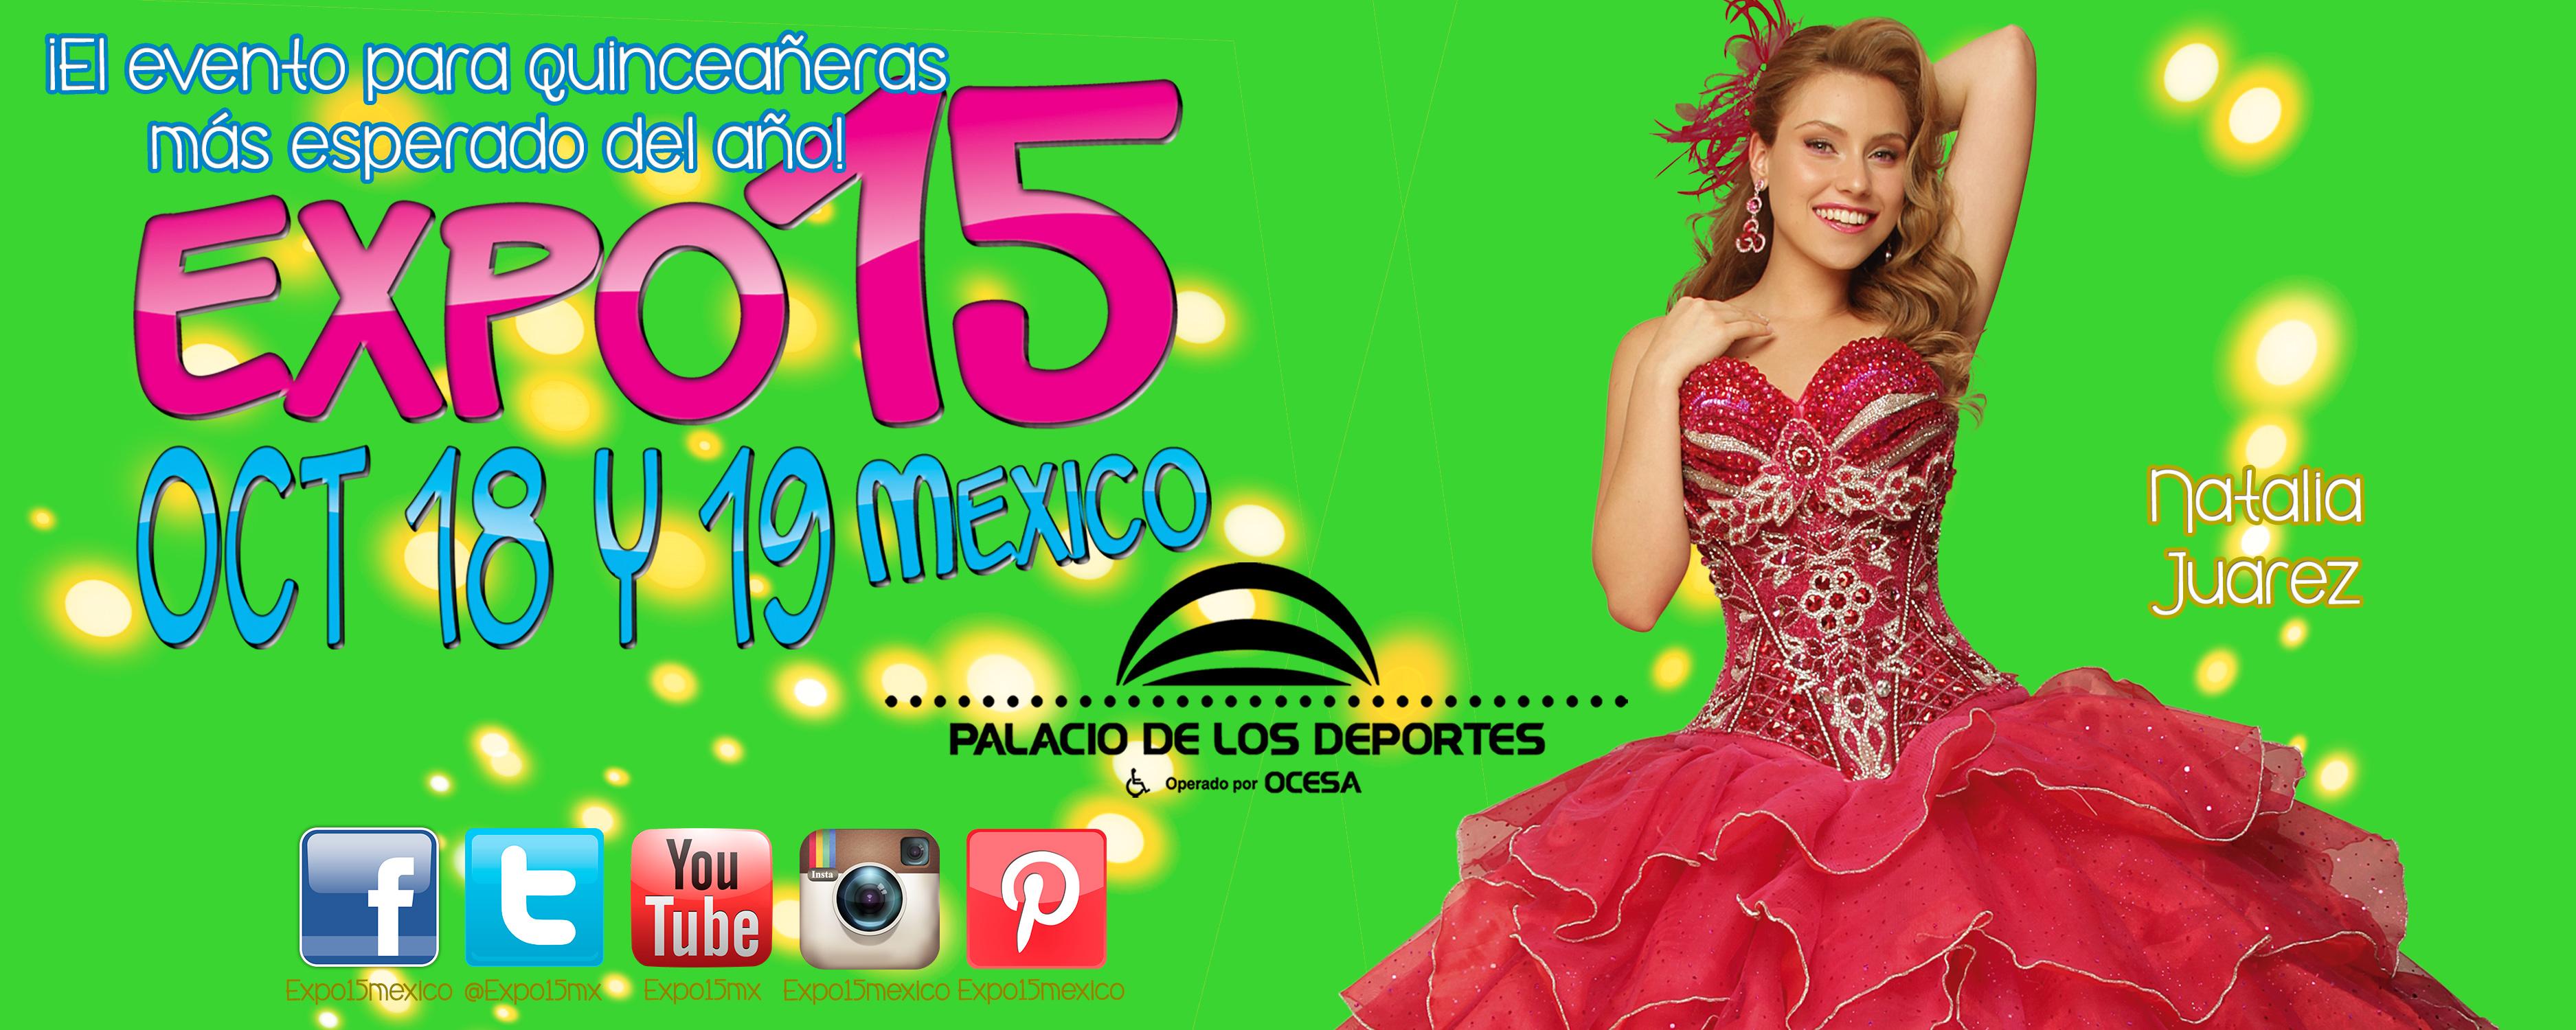 miss. 15